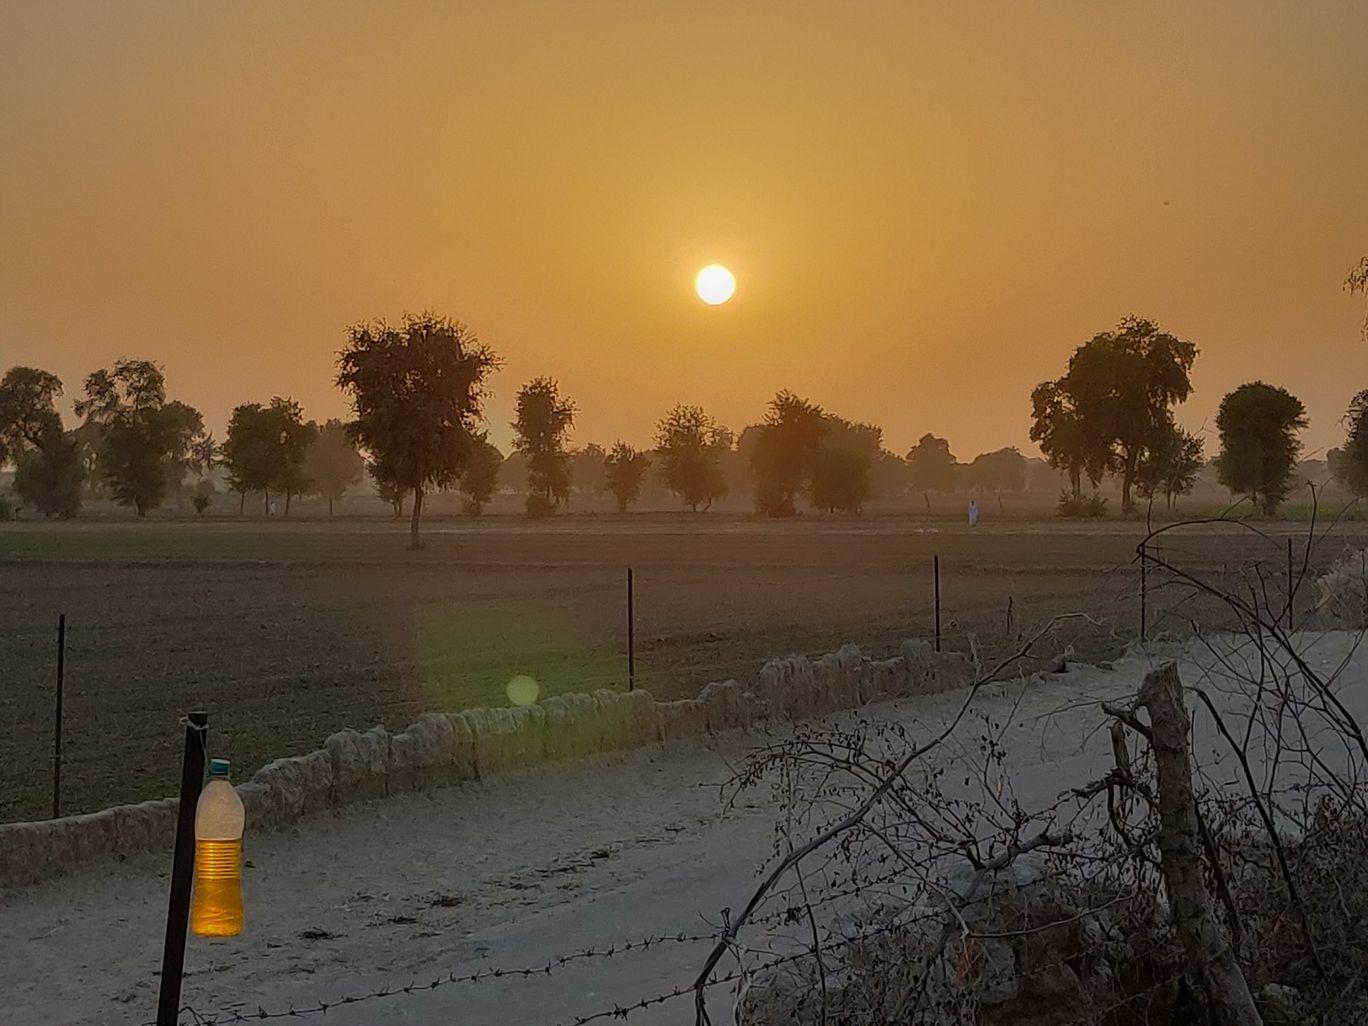 Photo of India By Chandan Kumar Singh